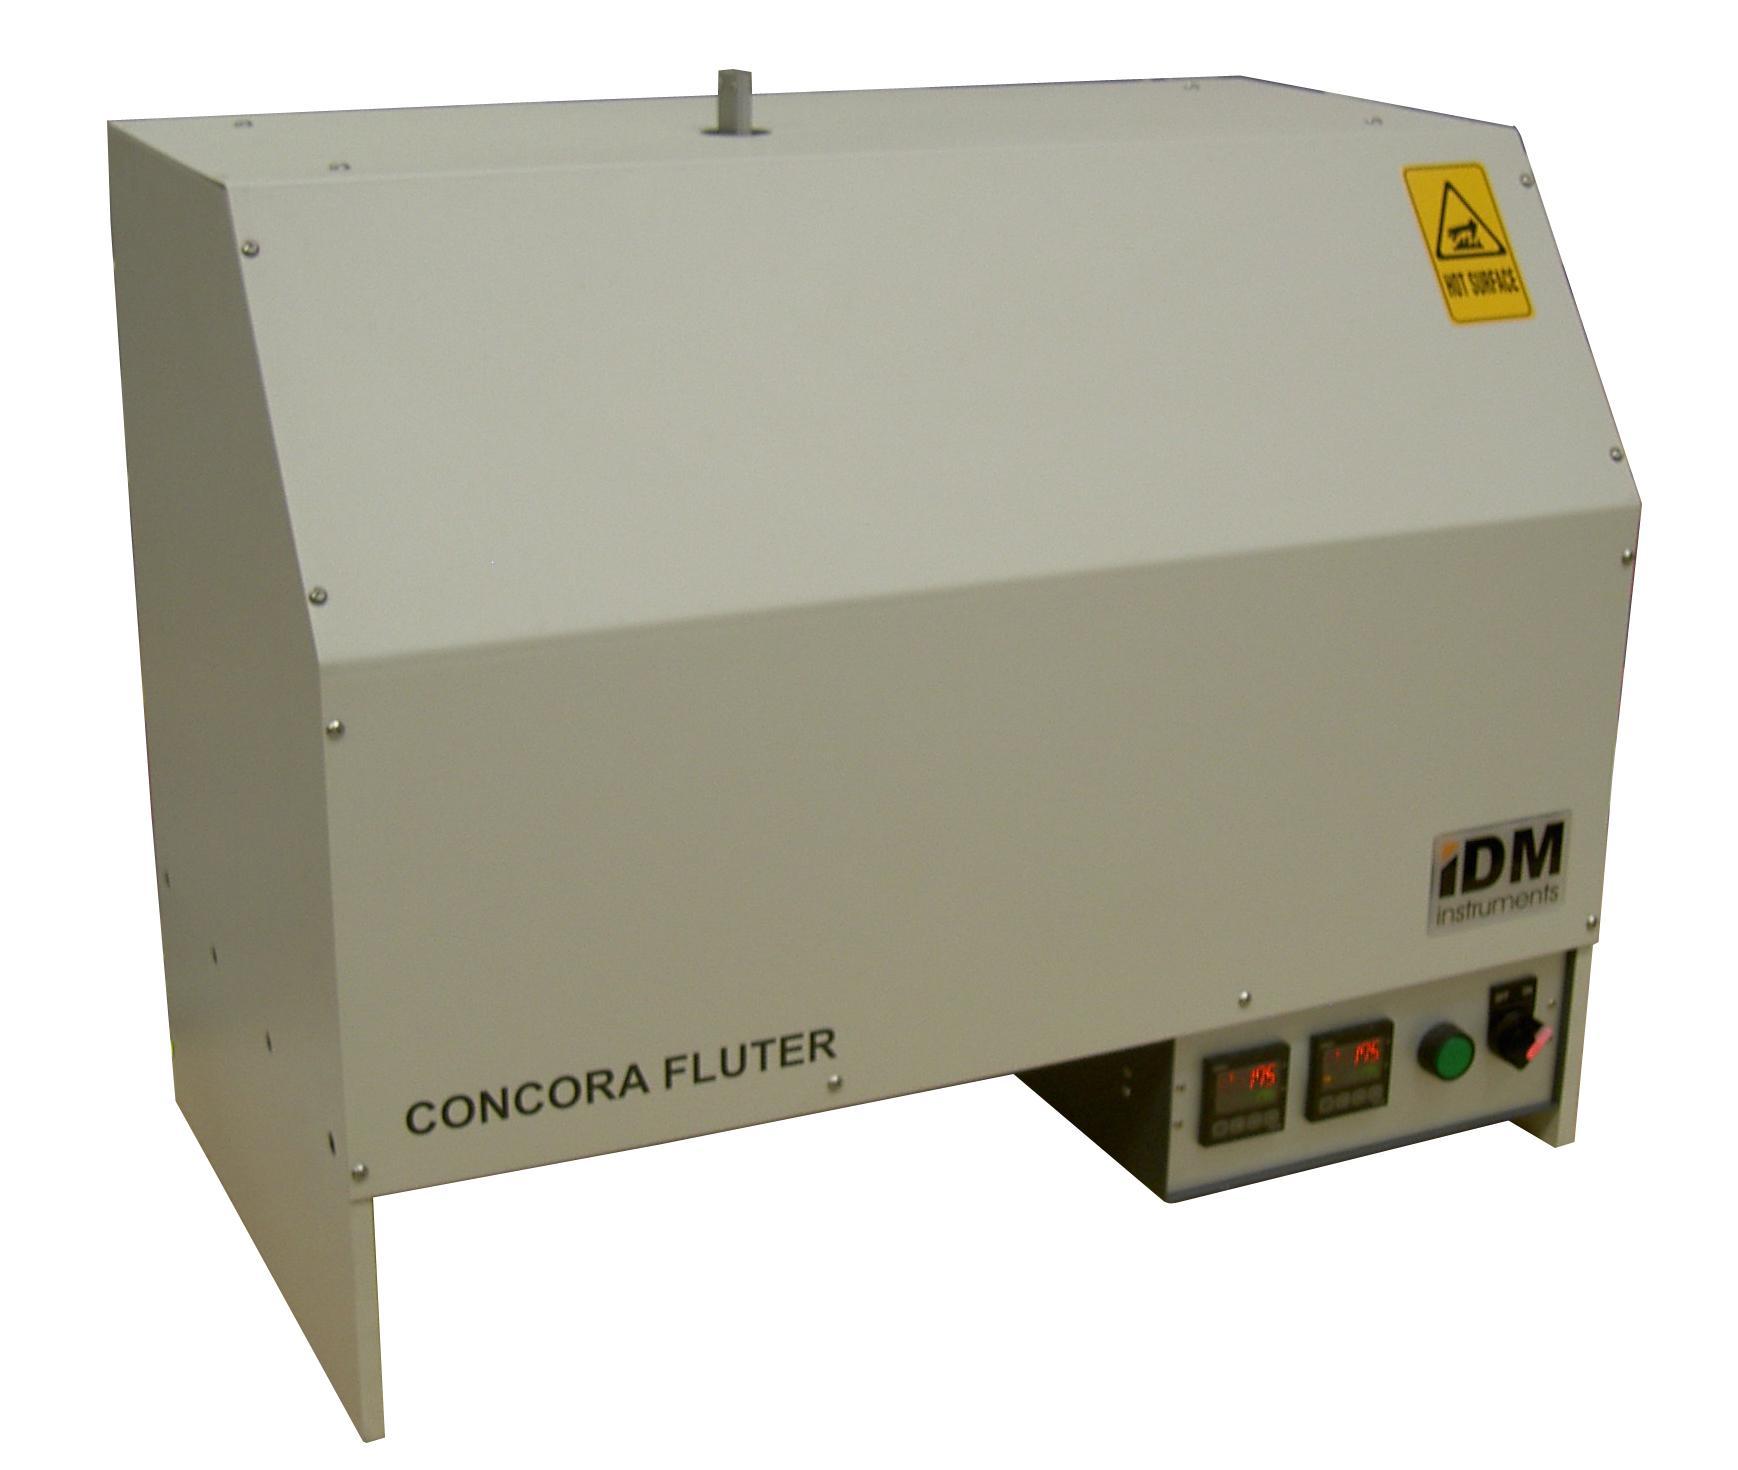 CONCORA FLUTER